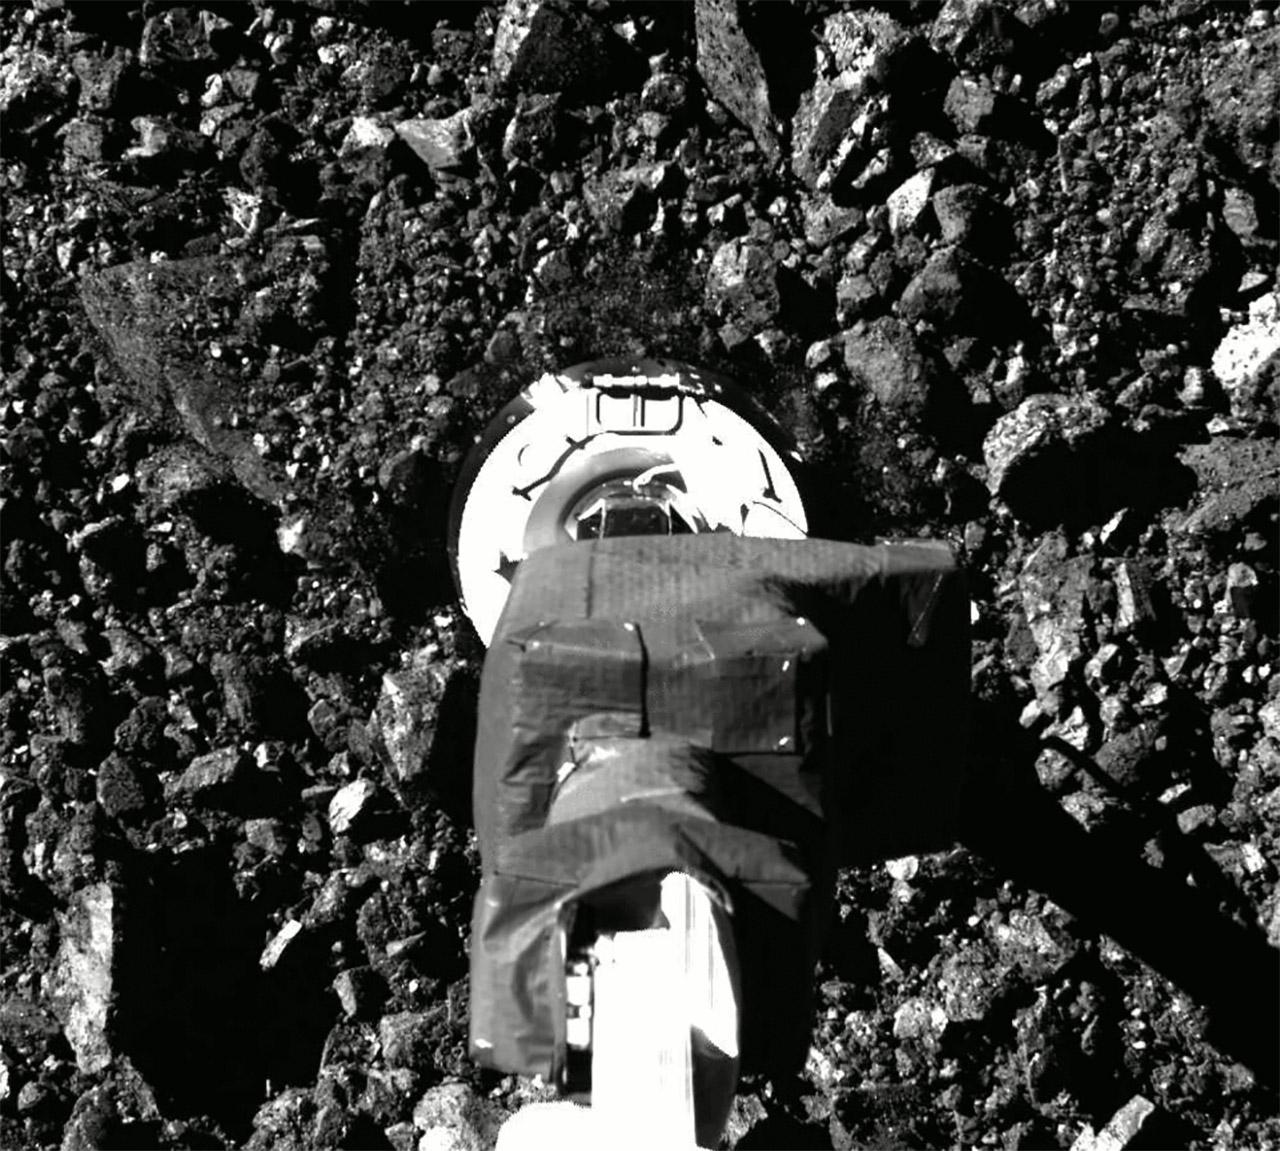 NASA OSIRIS-REx Asteroid Bennu Sample Collection